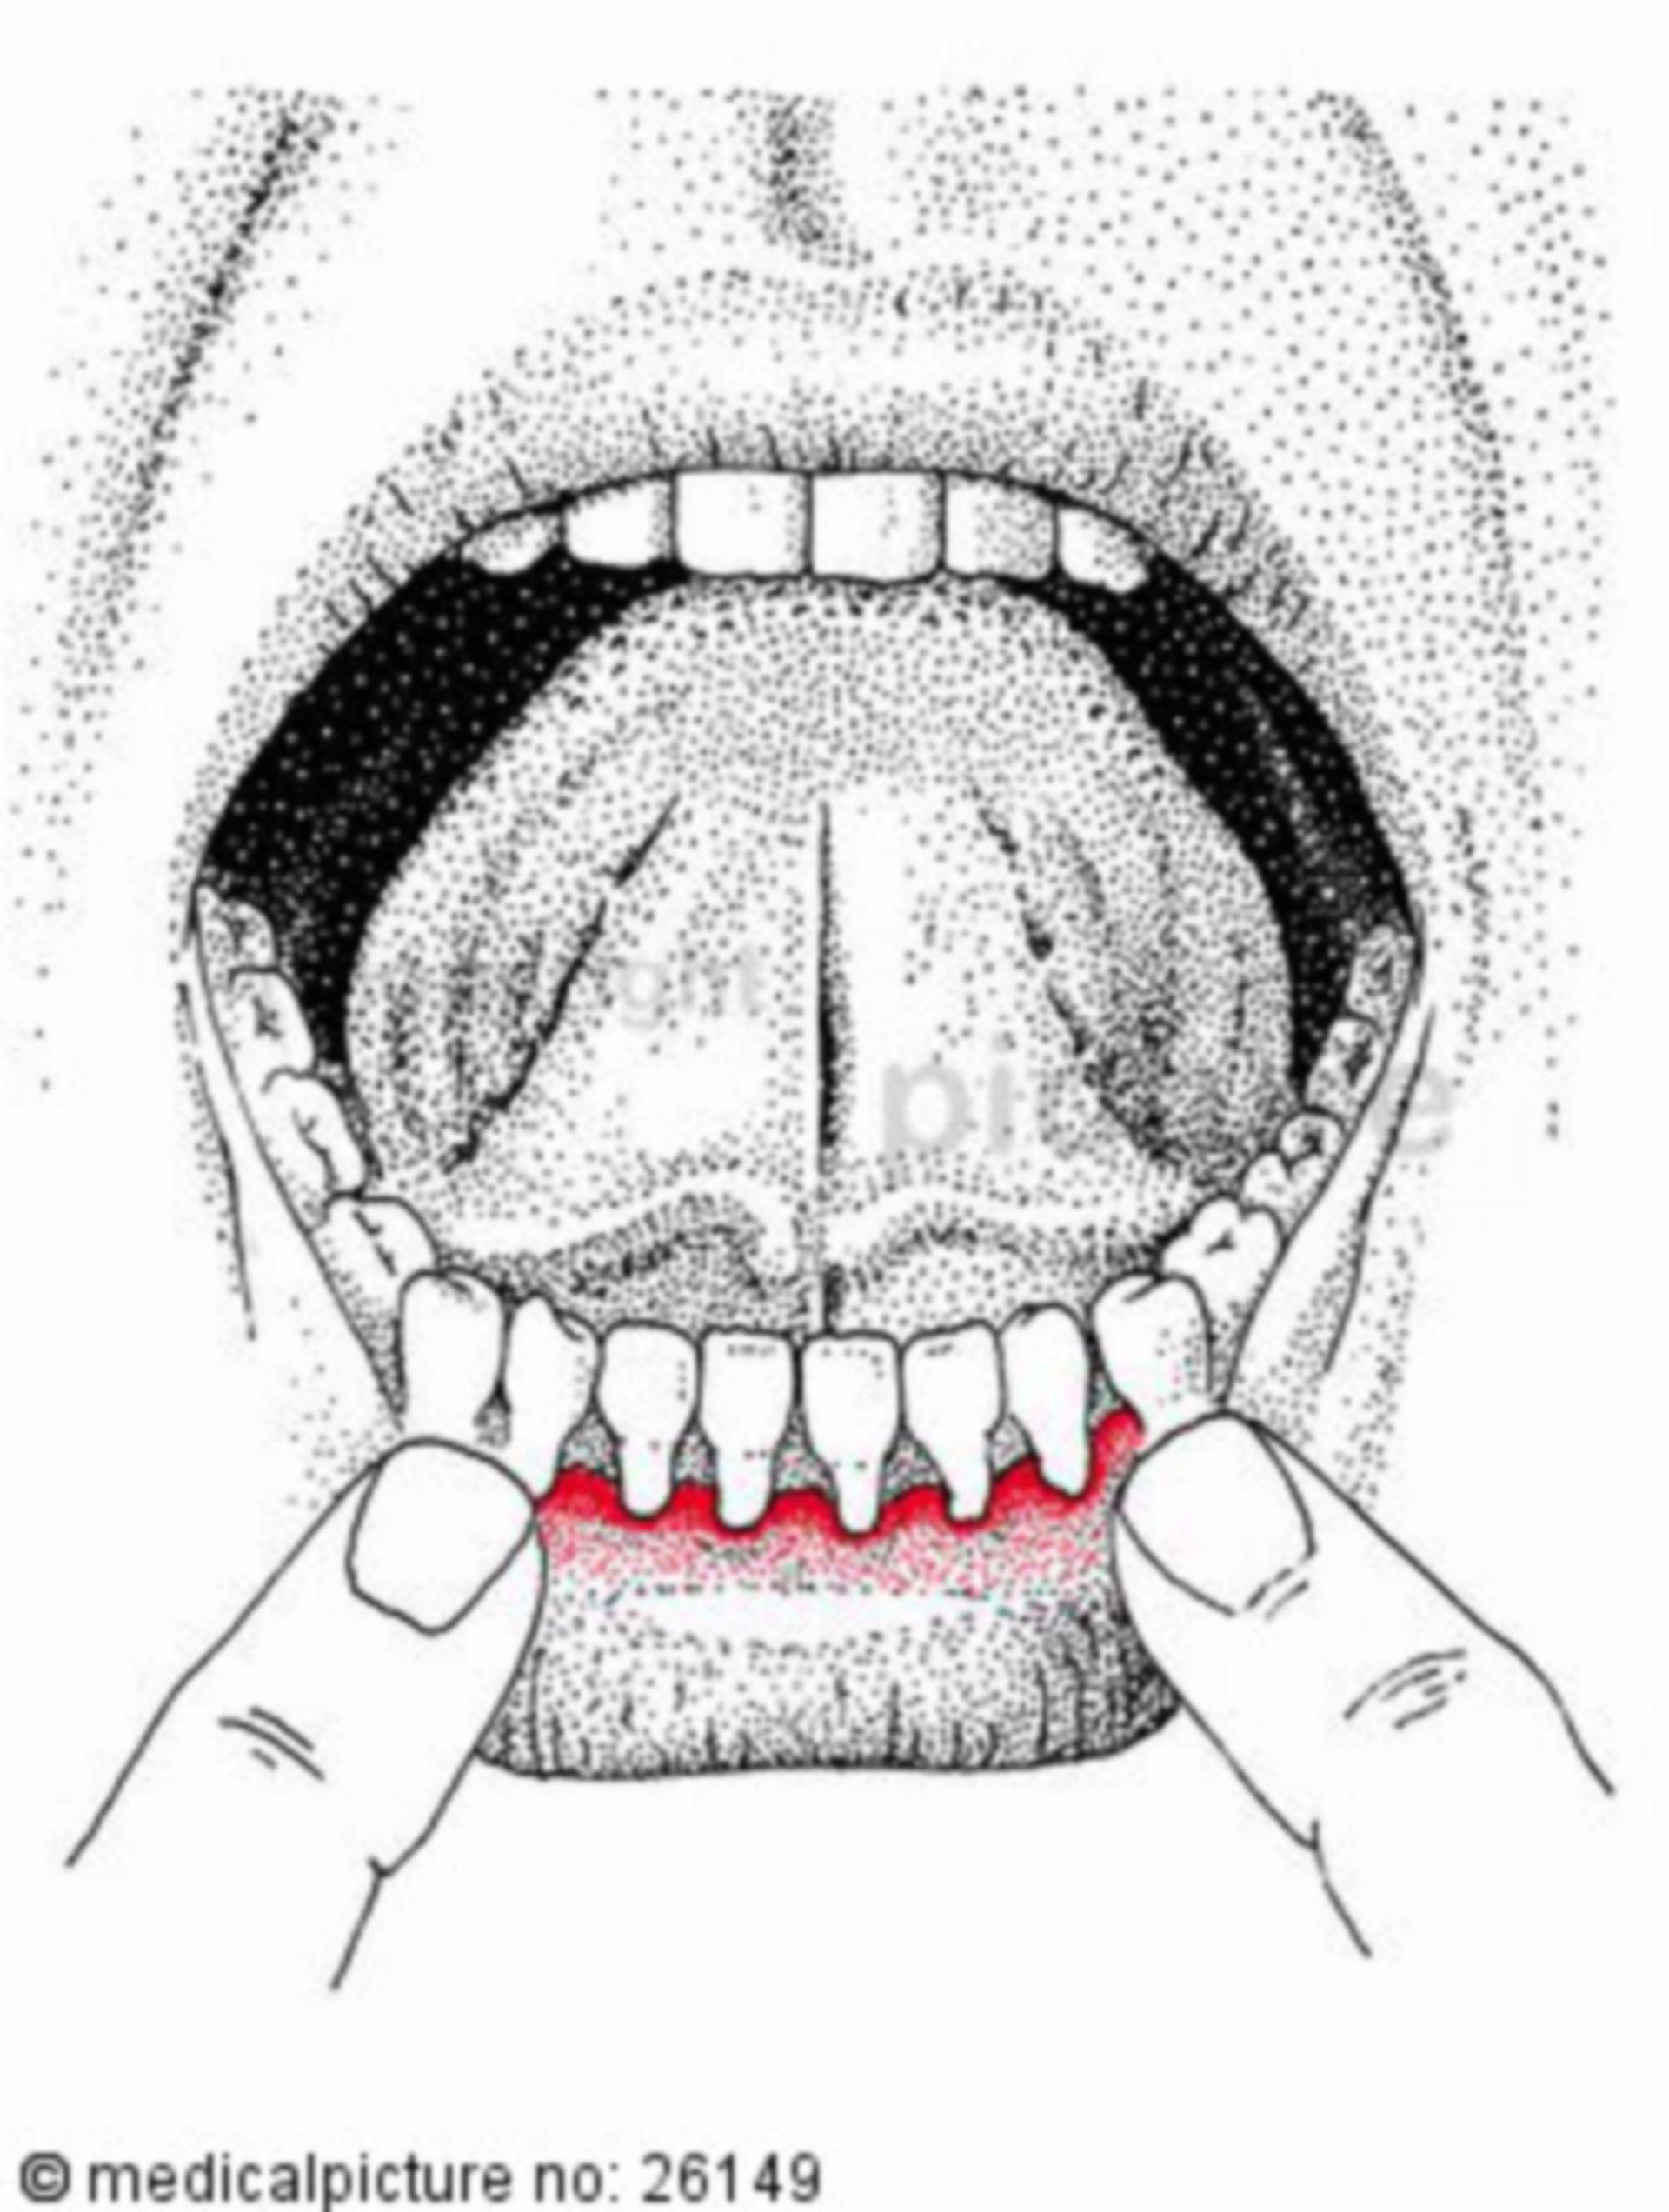 L'infiammazione delle gengive (gengivite)